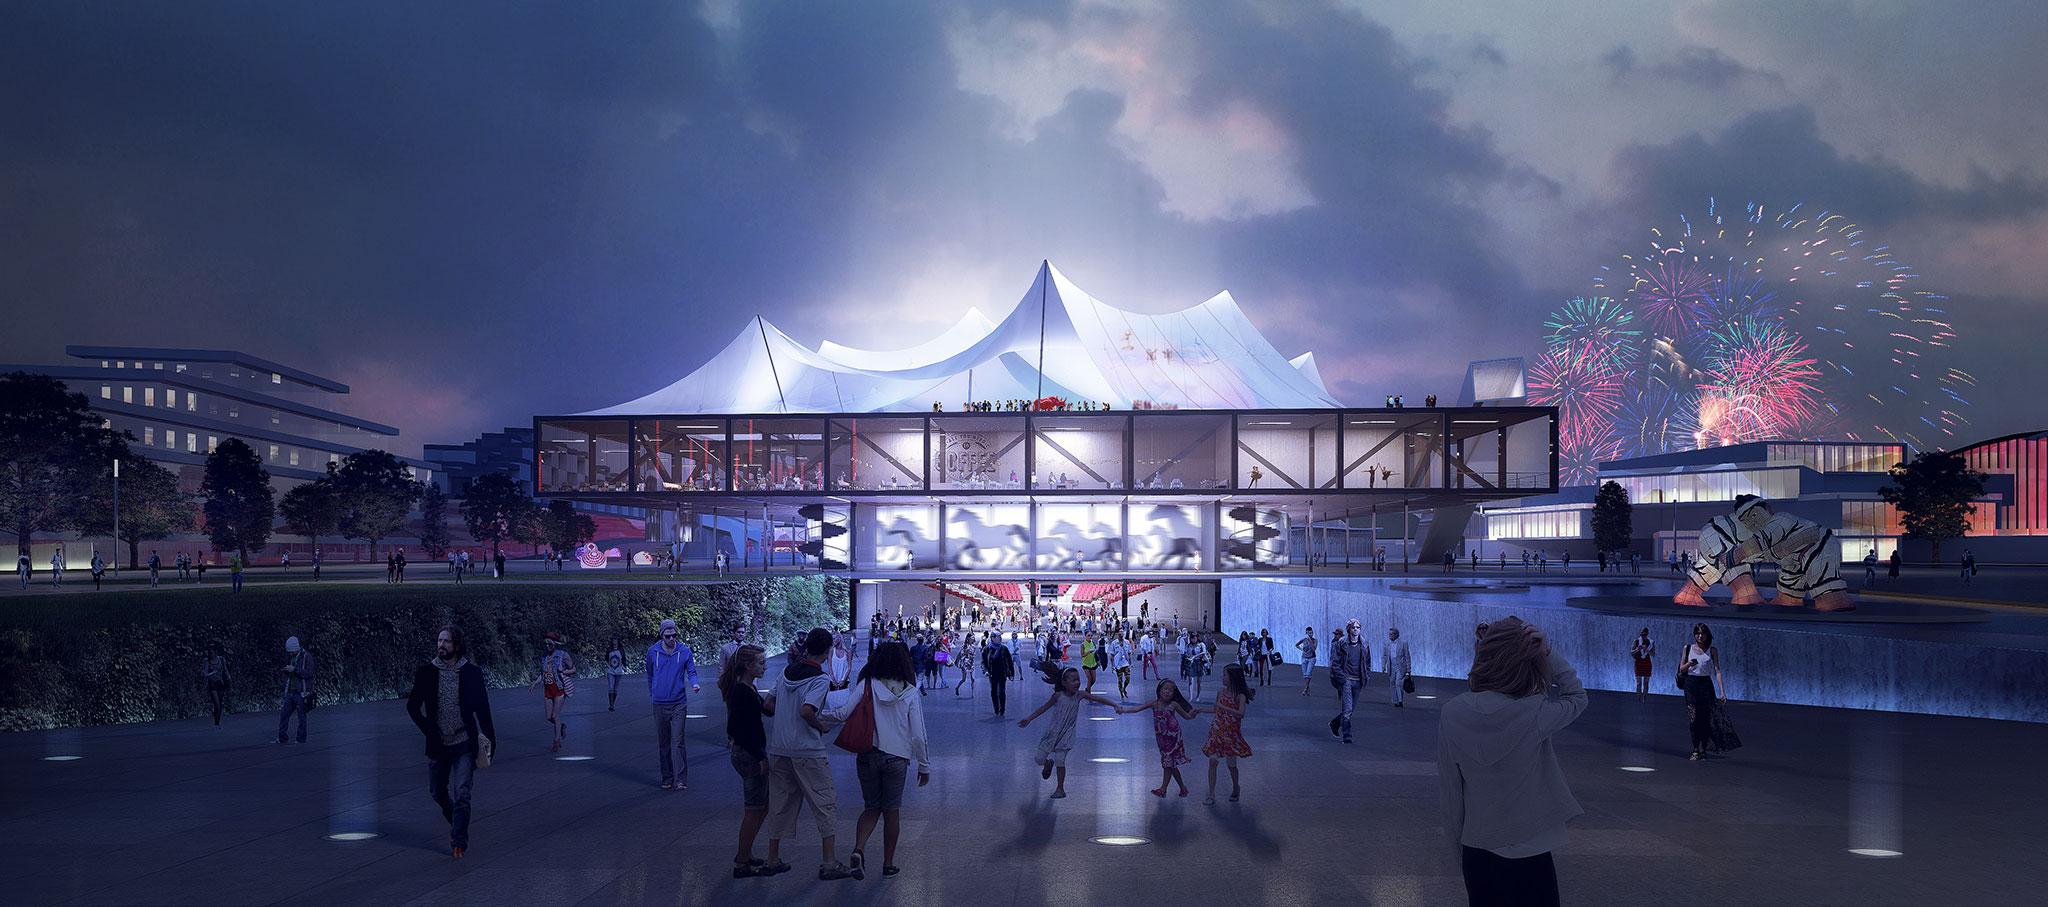 Cl Ment Blanchet Architecture Gana El Concurso